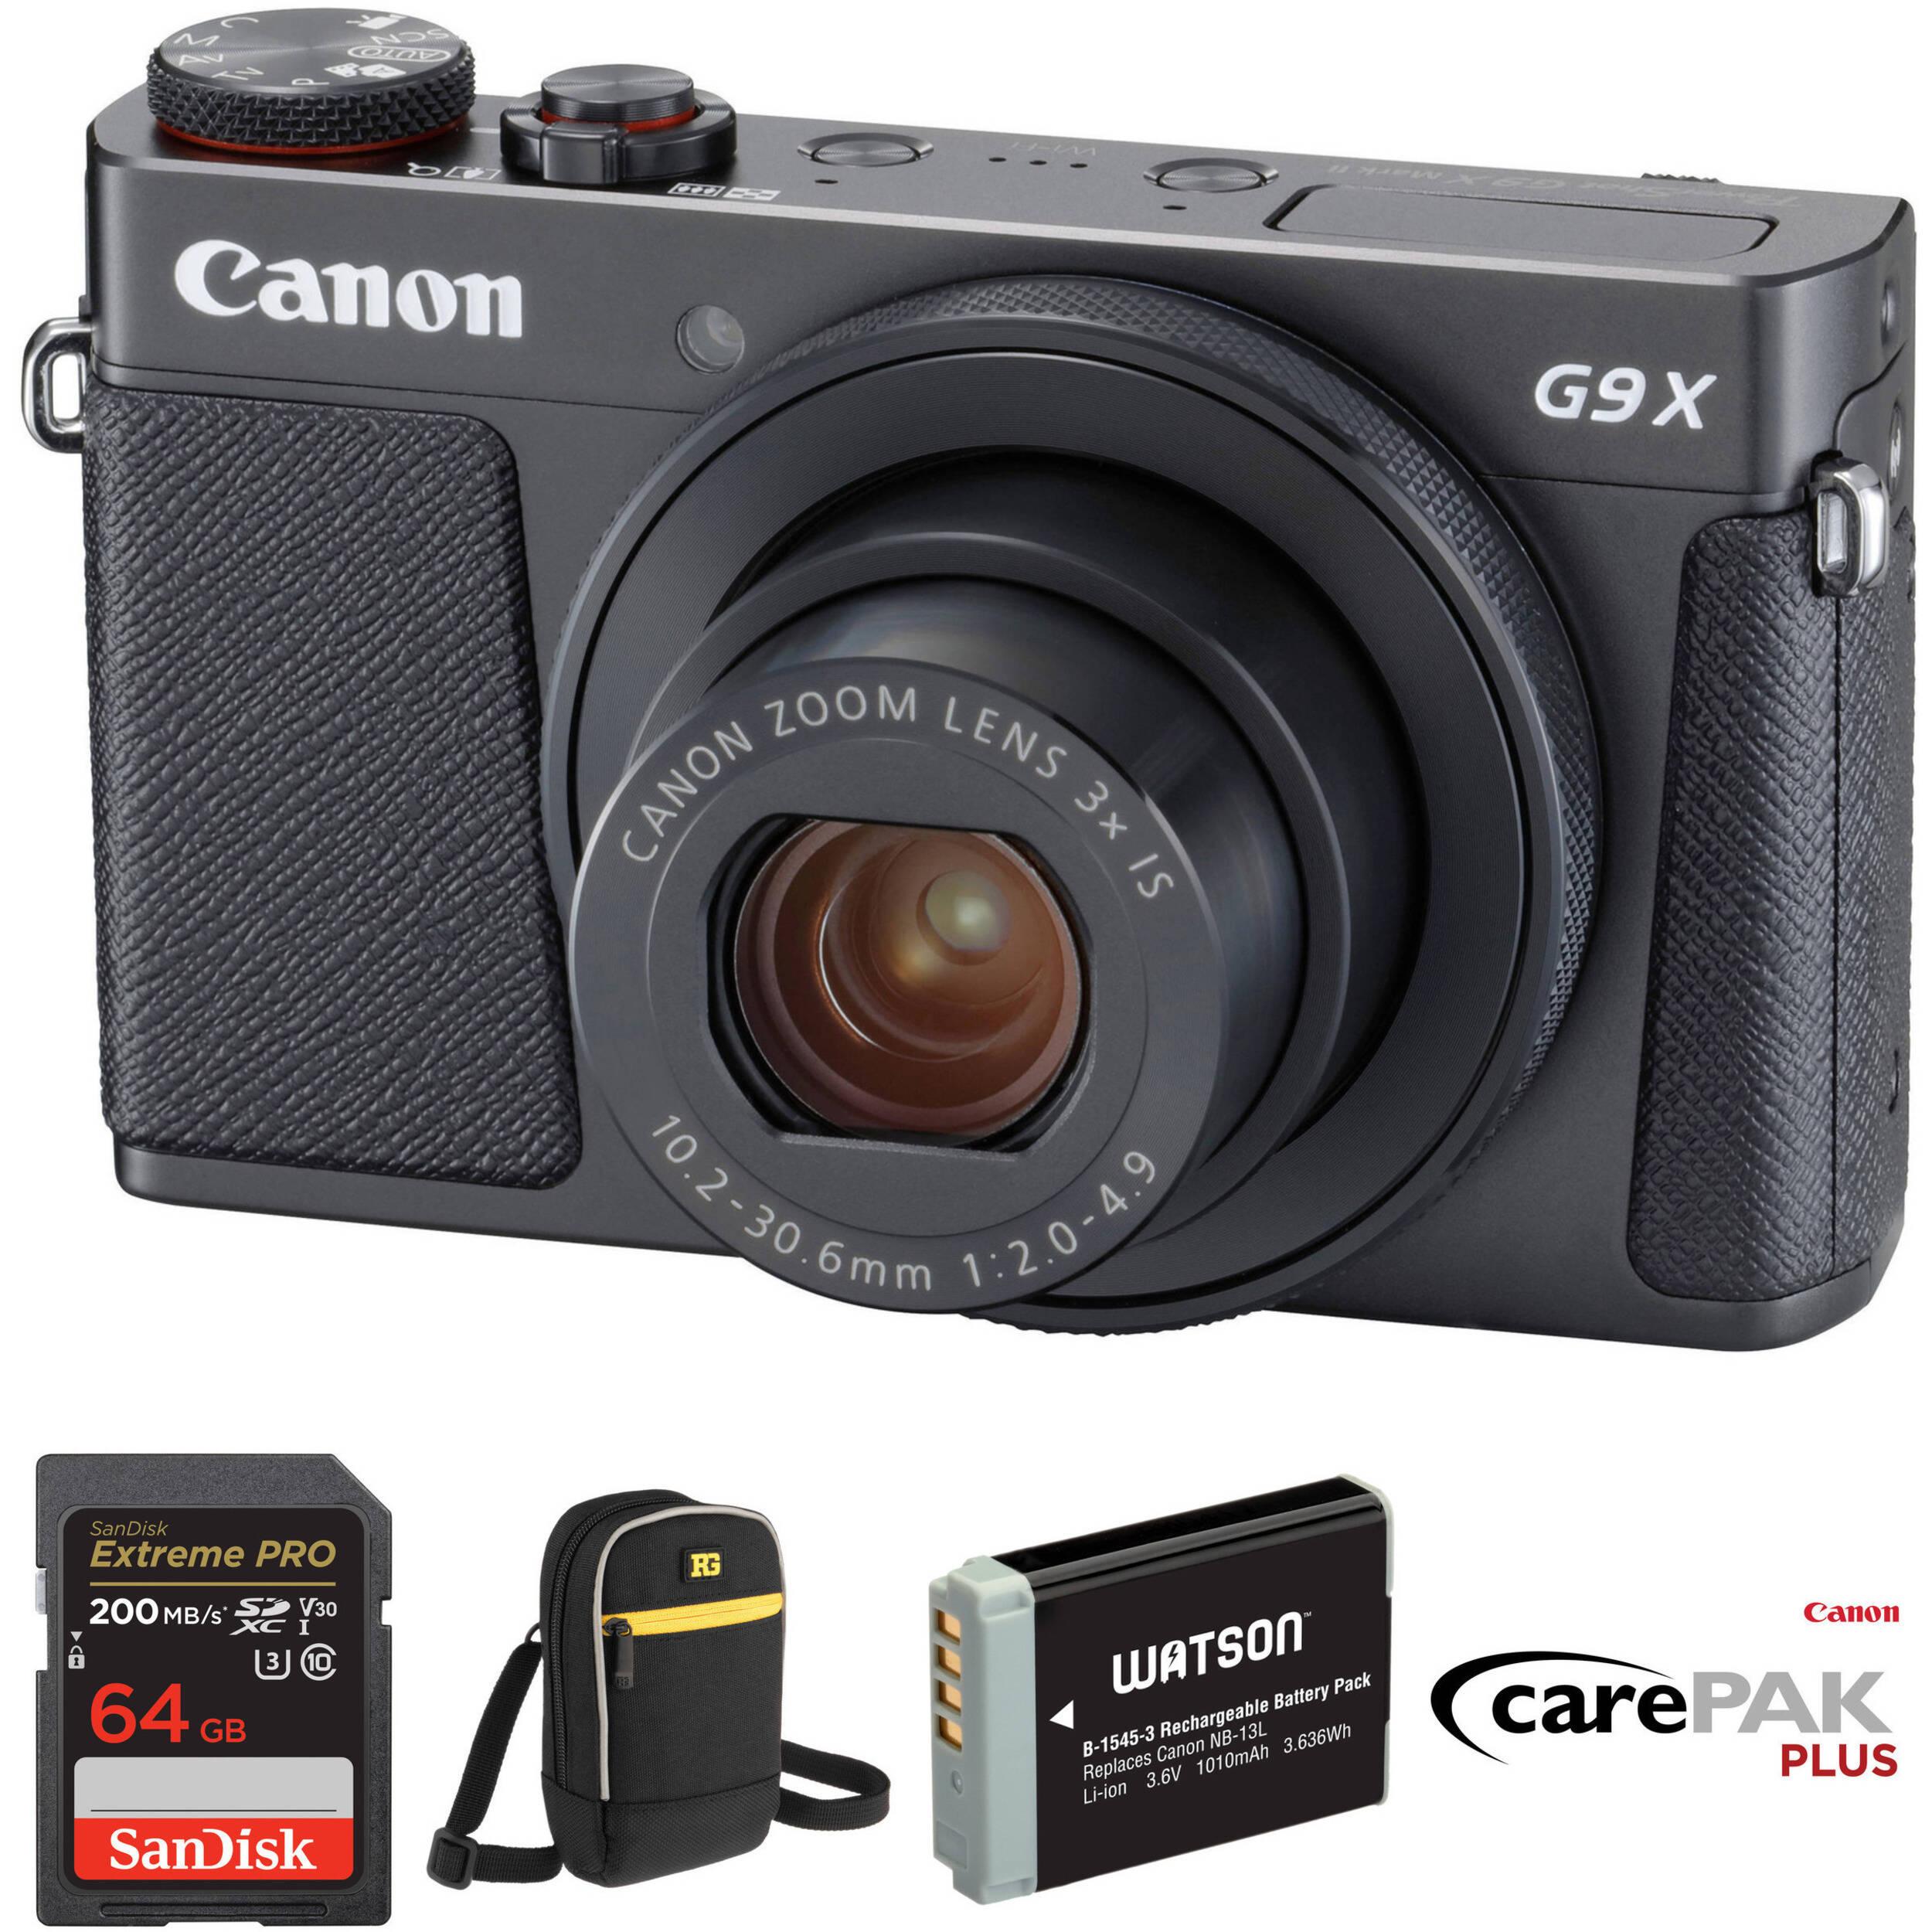 canon powershot g9 x mark ii digital camera deluxe kit black rh bhphotovideo com canon powershot g9 x user manual canon powershot g9 user manual